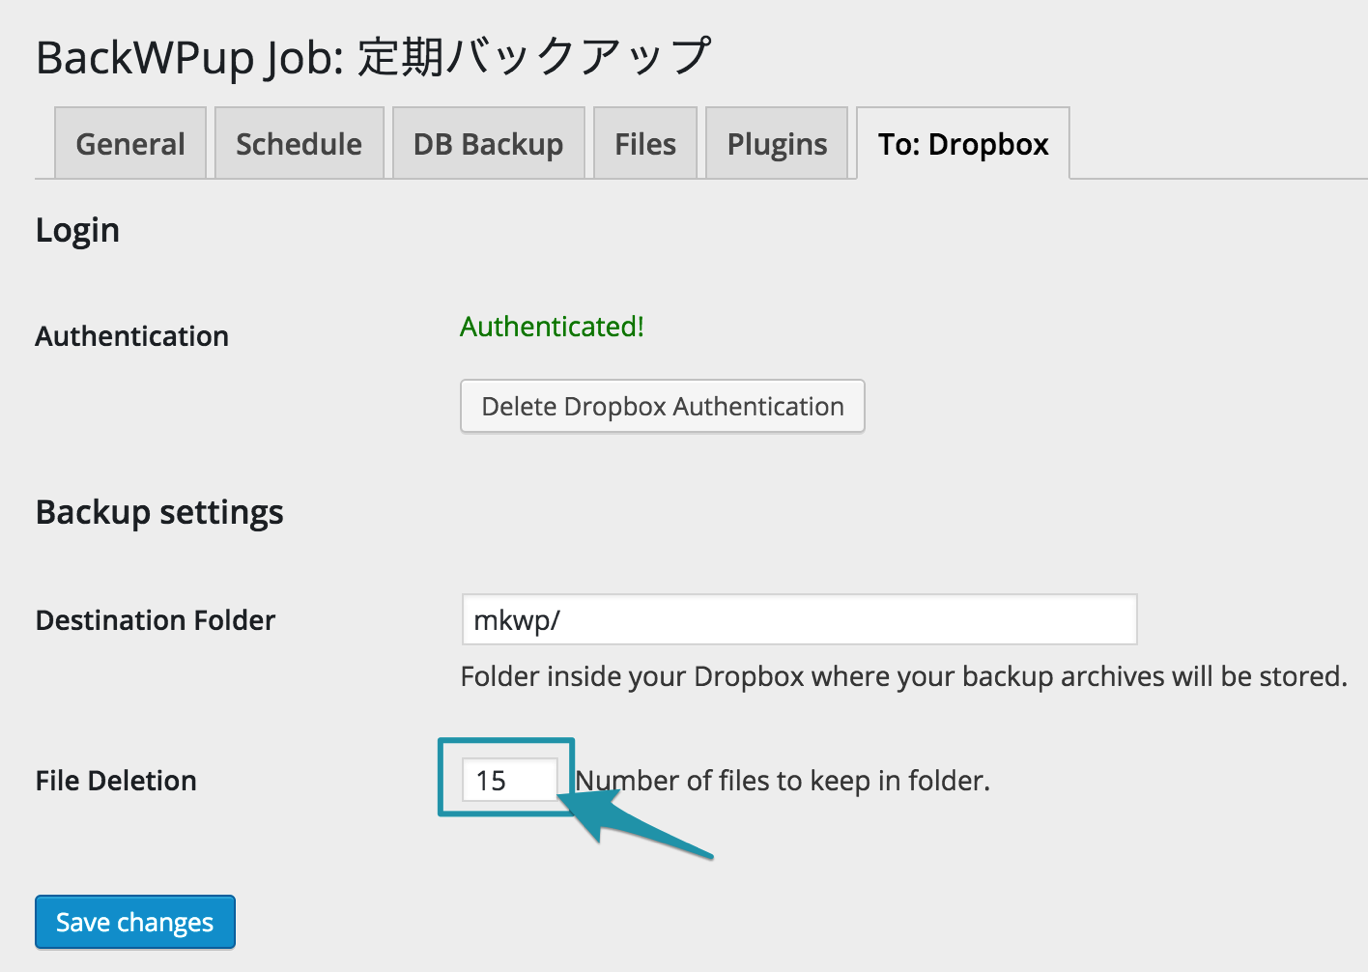 backWPupのバックアップ保存回数